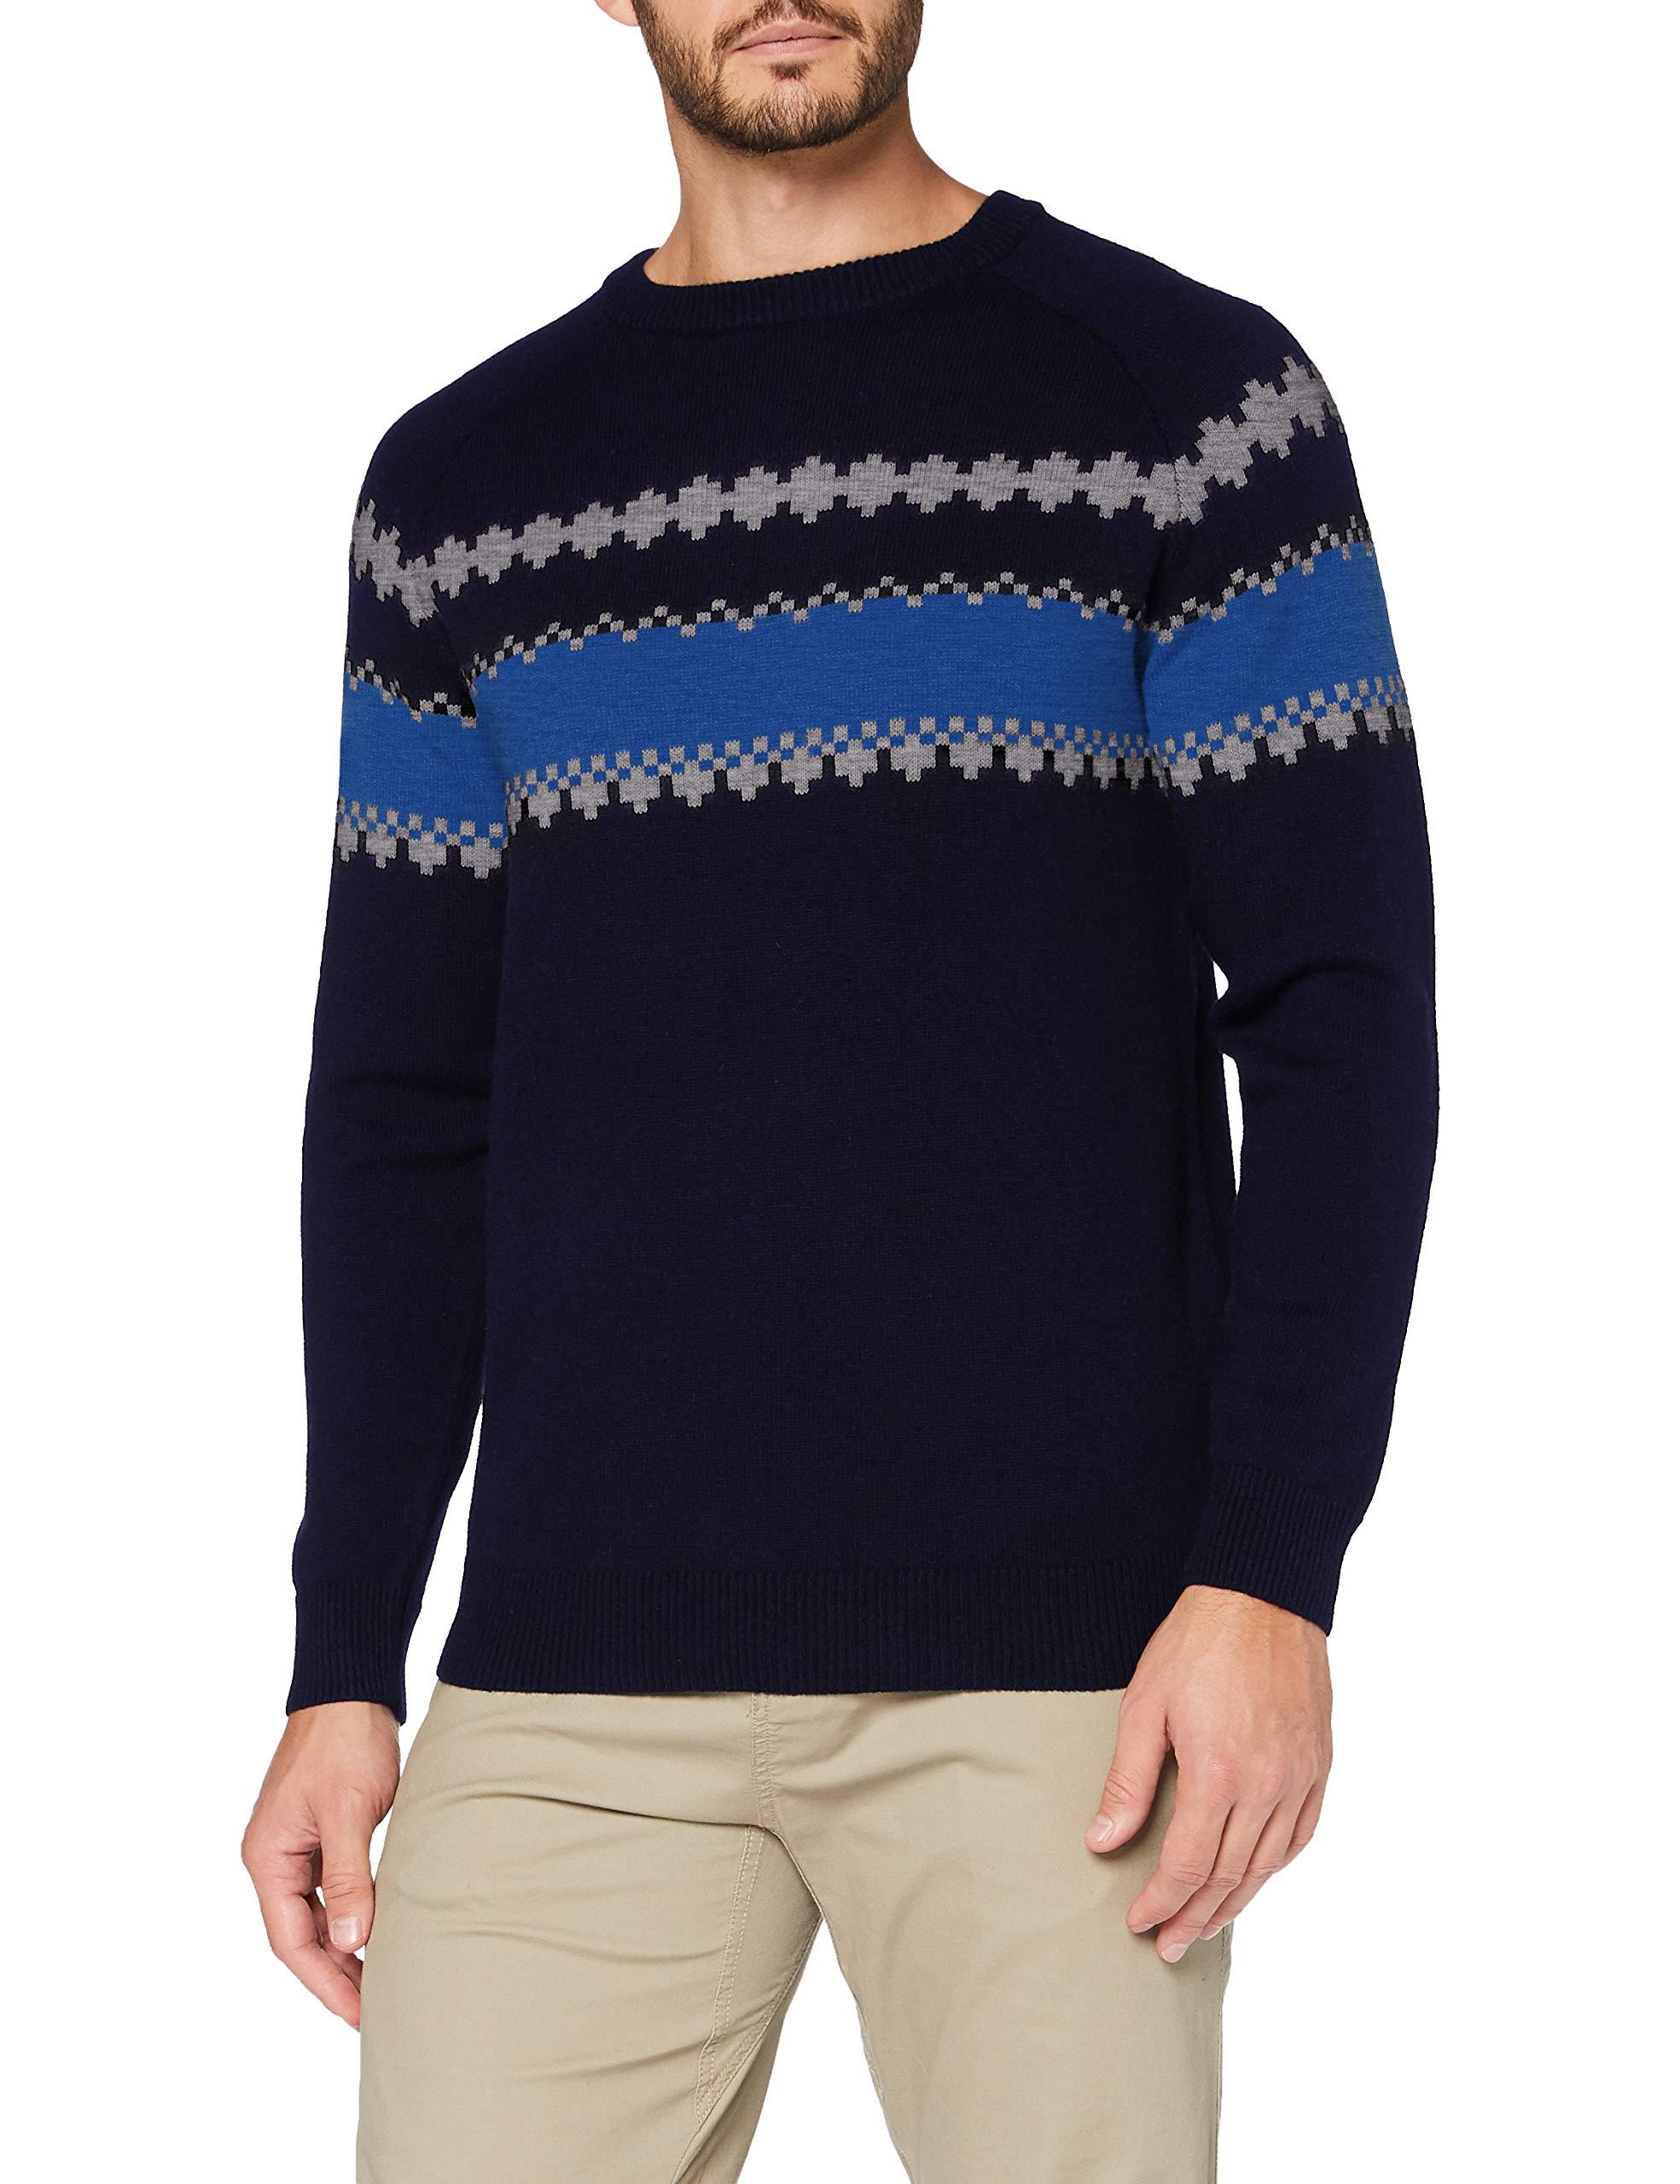 Helly Hansen Herren Wool Knit Sweatshirt, Navy, S